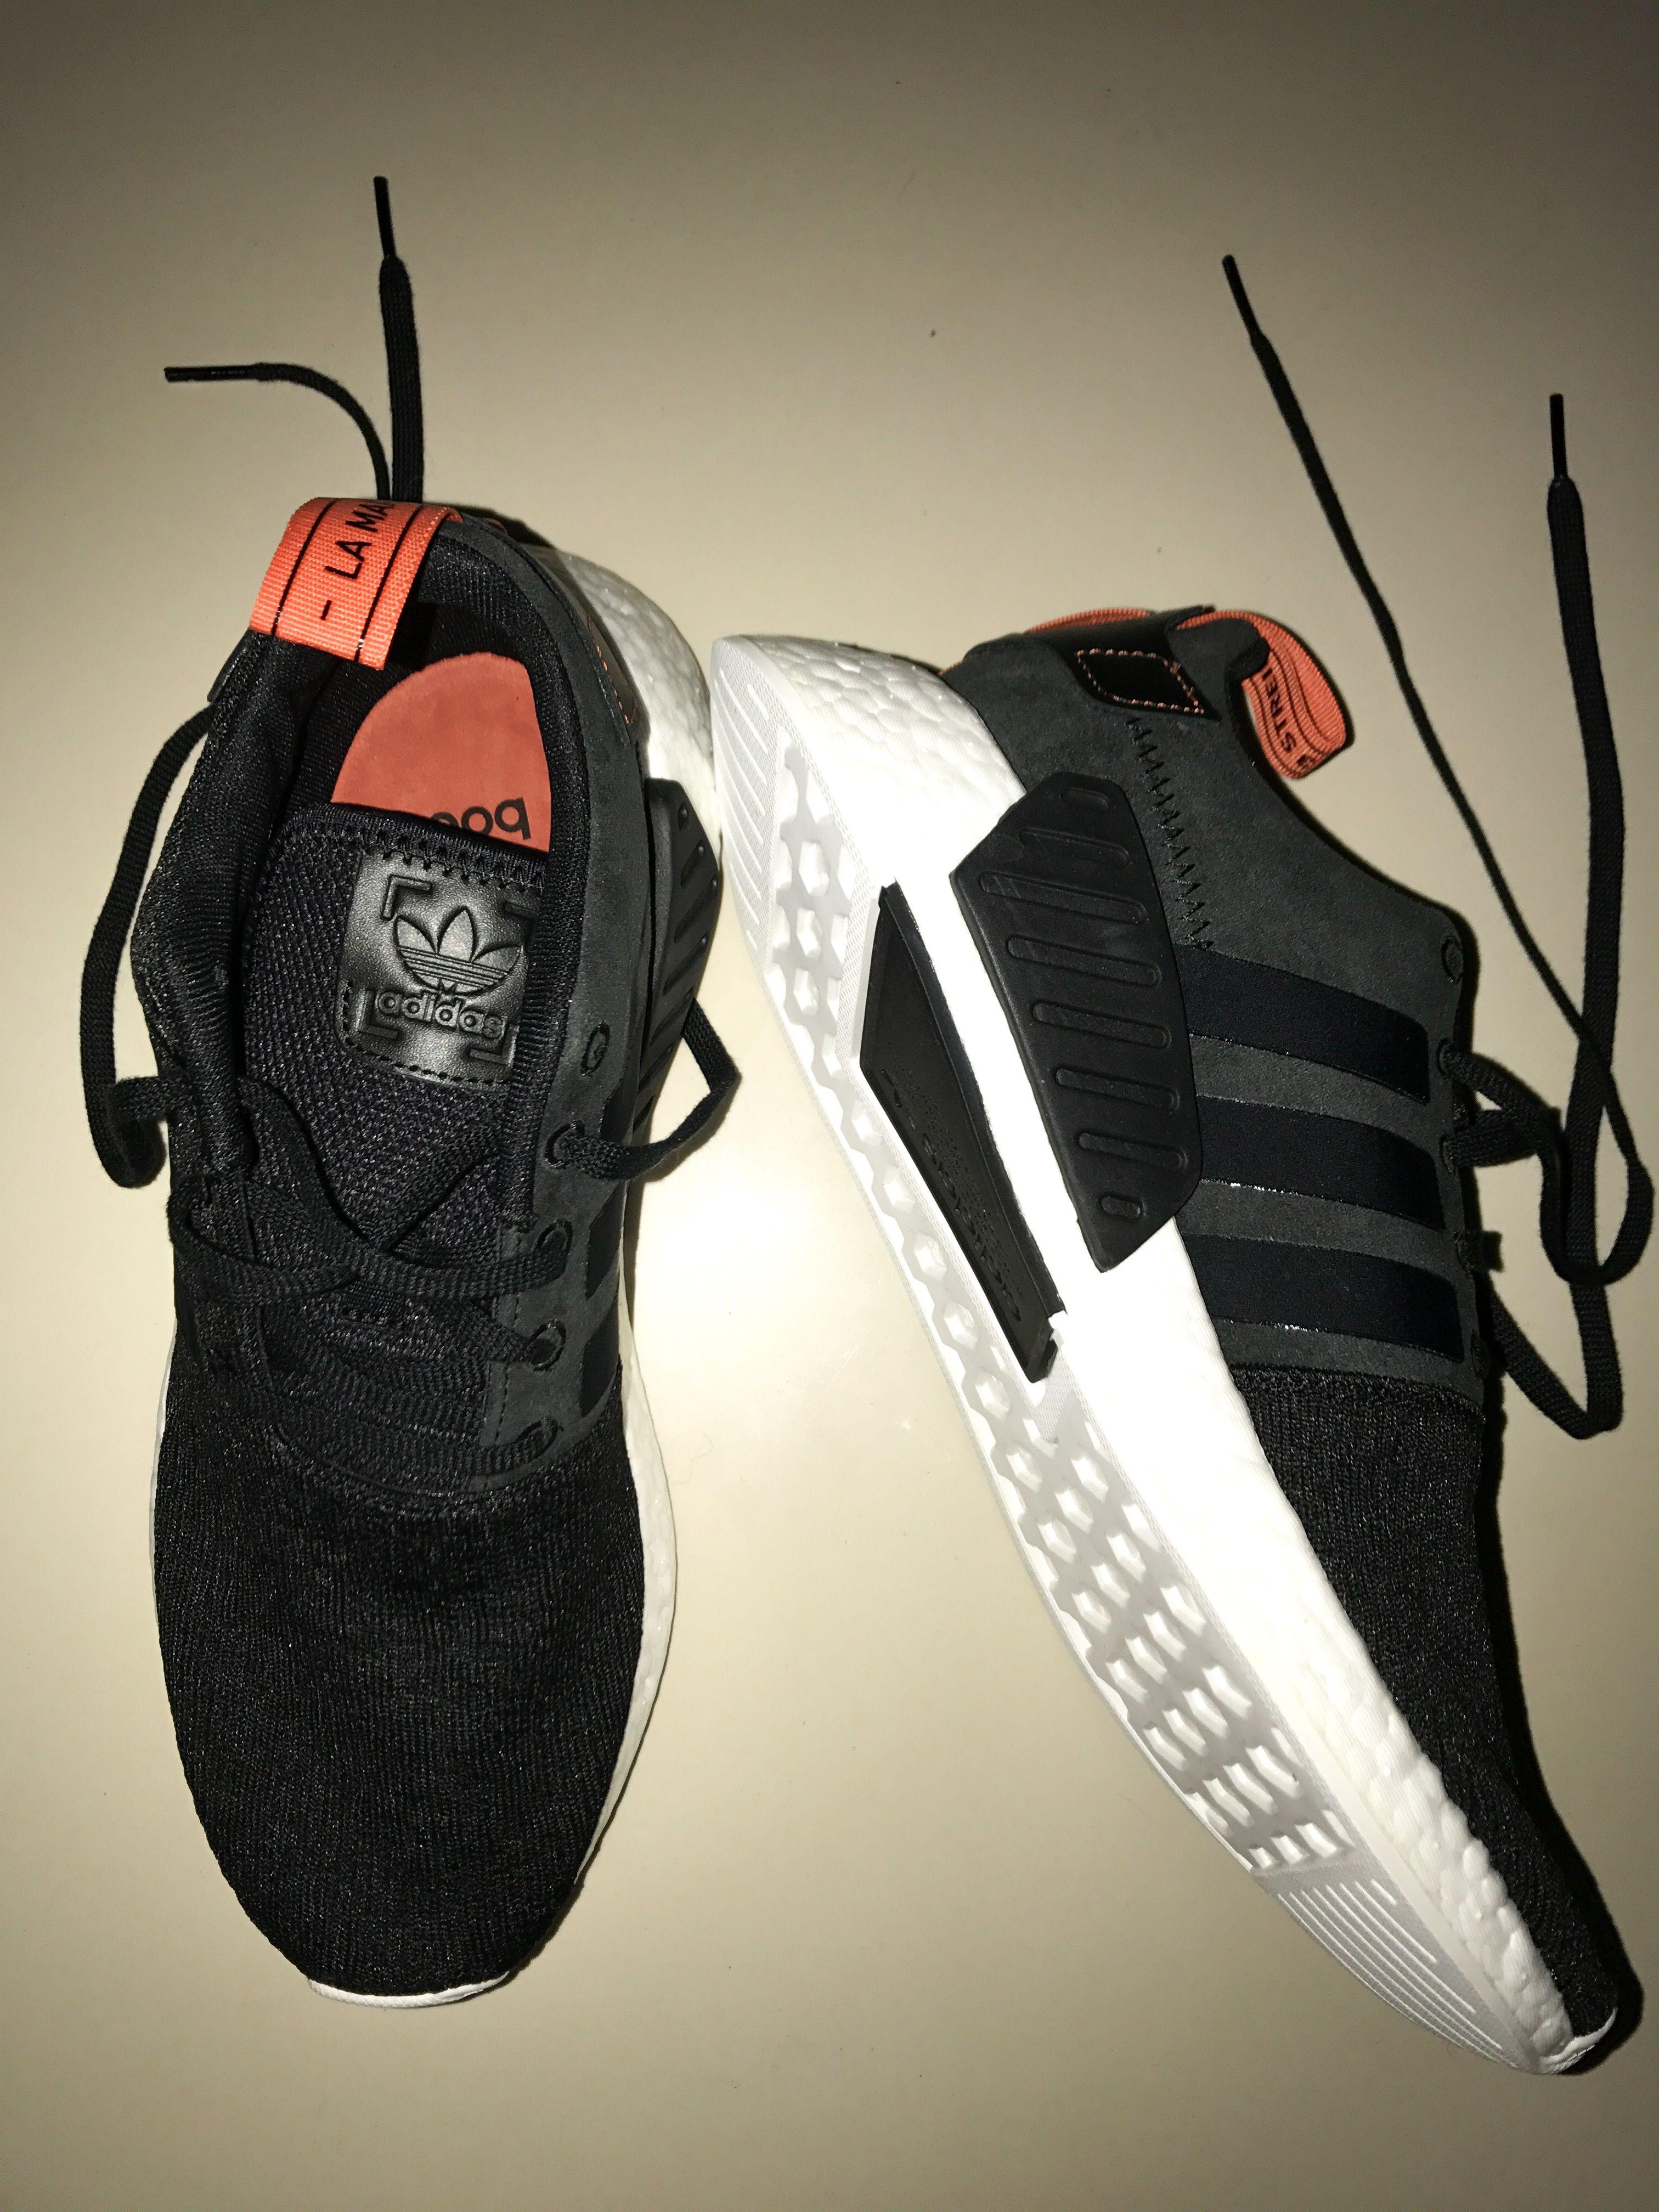 NMD_r2 (CG3384)   Adidas   Adidas nmd, Shoes, Adidas nmd r2